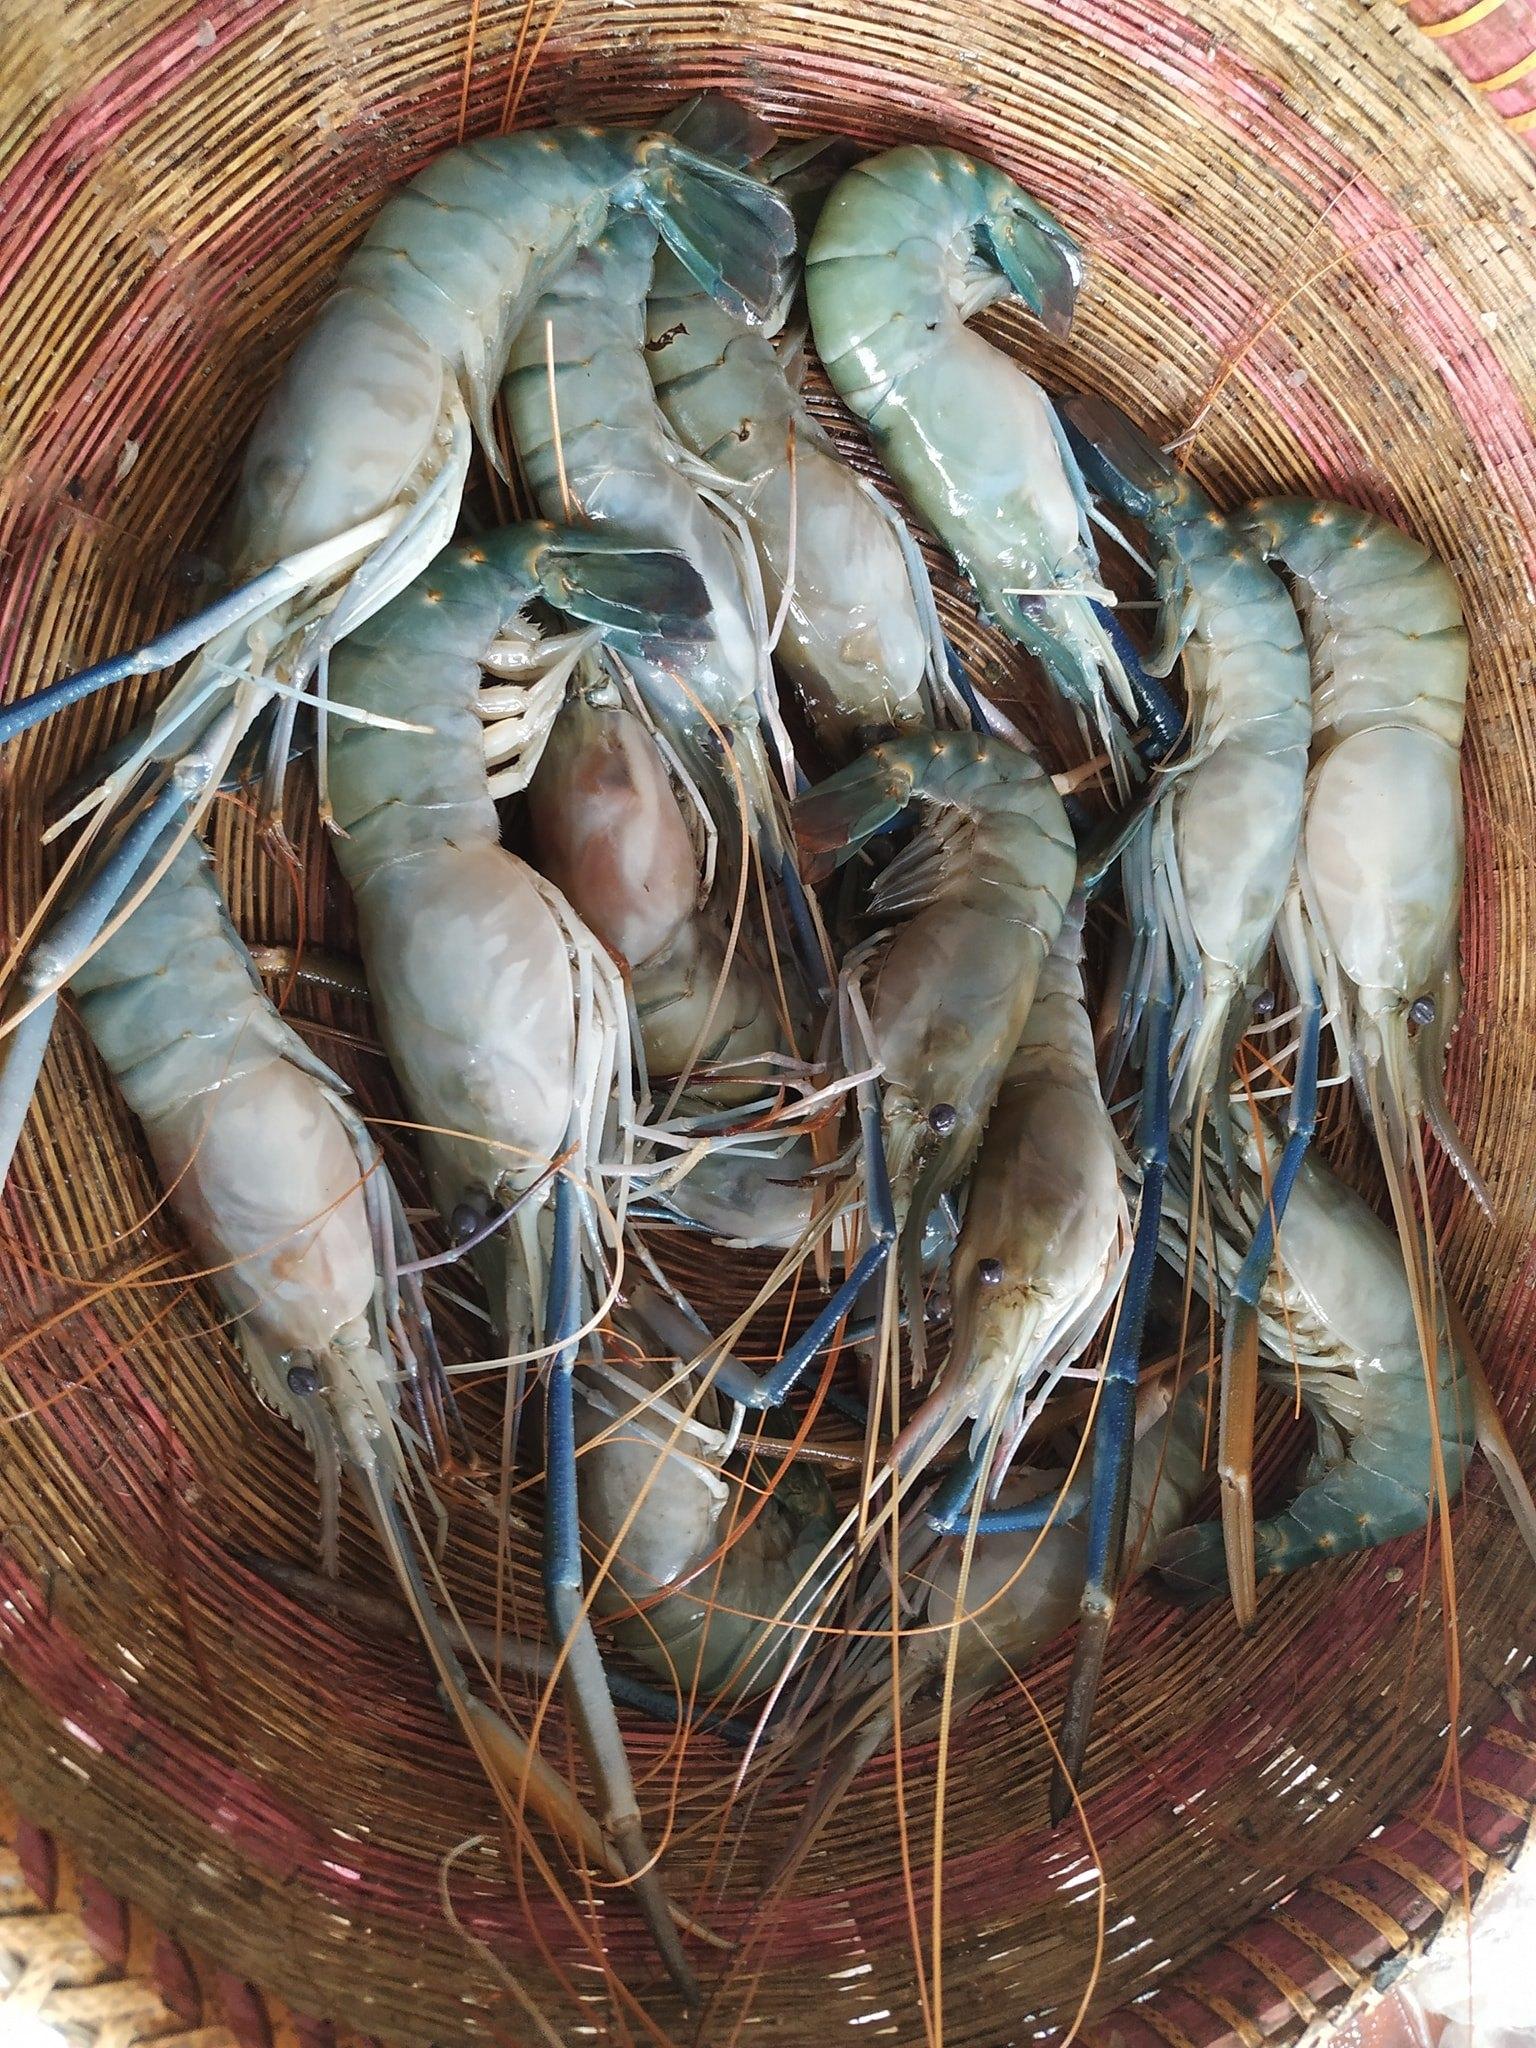 Chingri Golda Medium Size River Fish (25-35pcs/1kg)